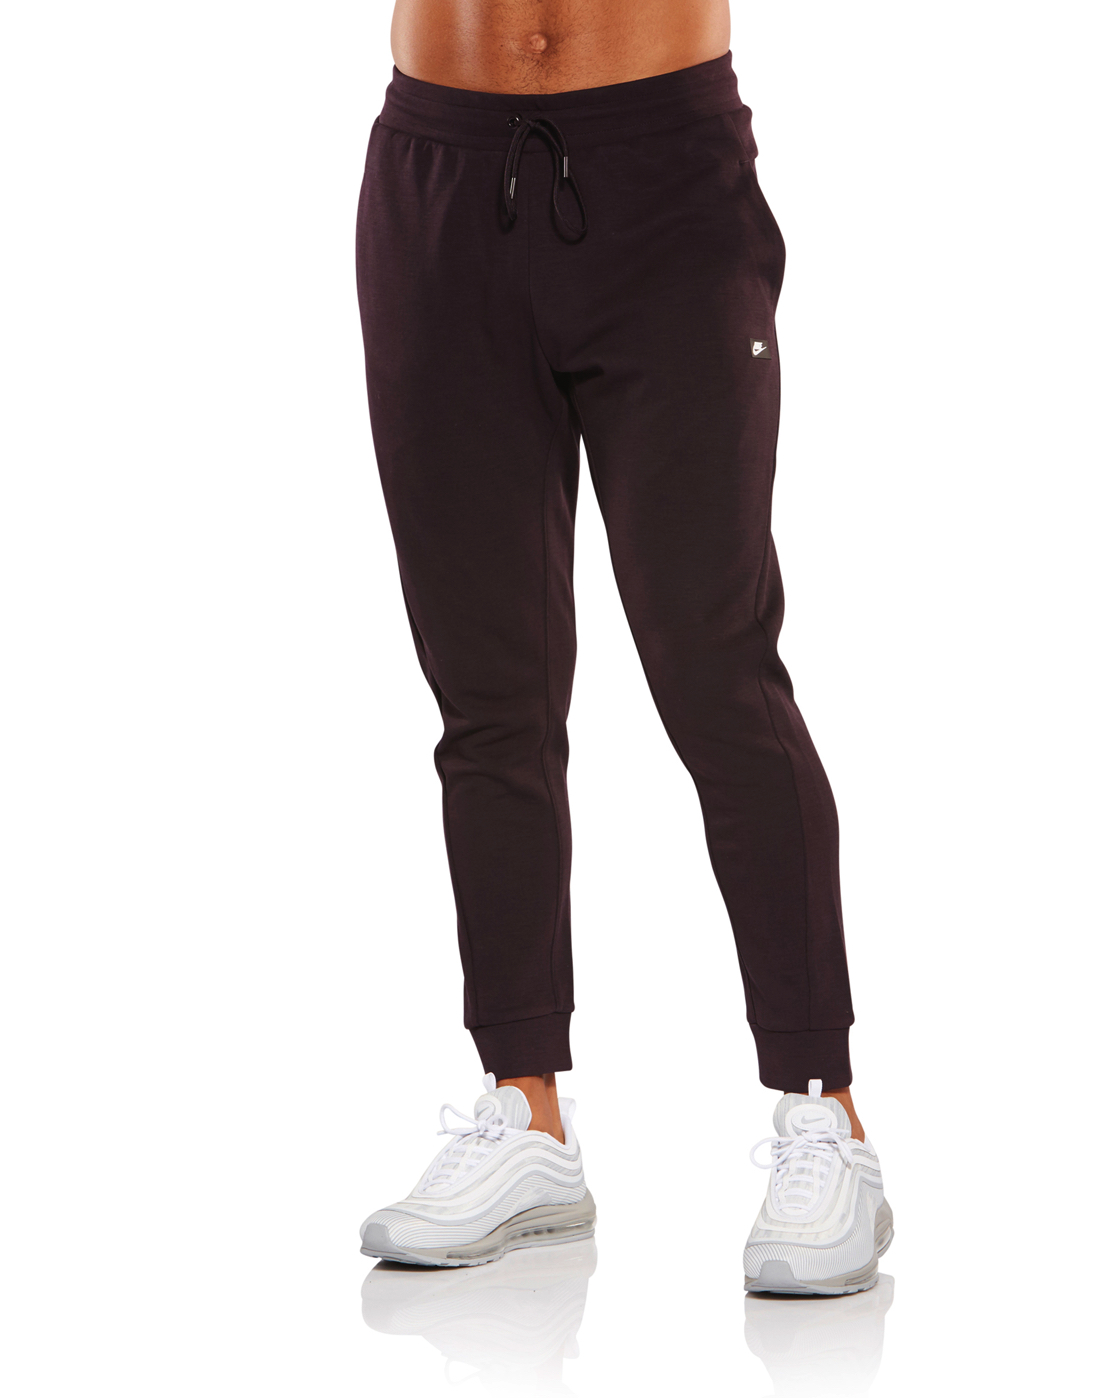 a5985539bd22 Men's Burgundy Nike Joggers   Life Style Sports